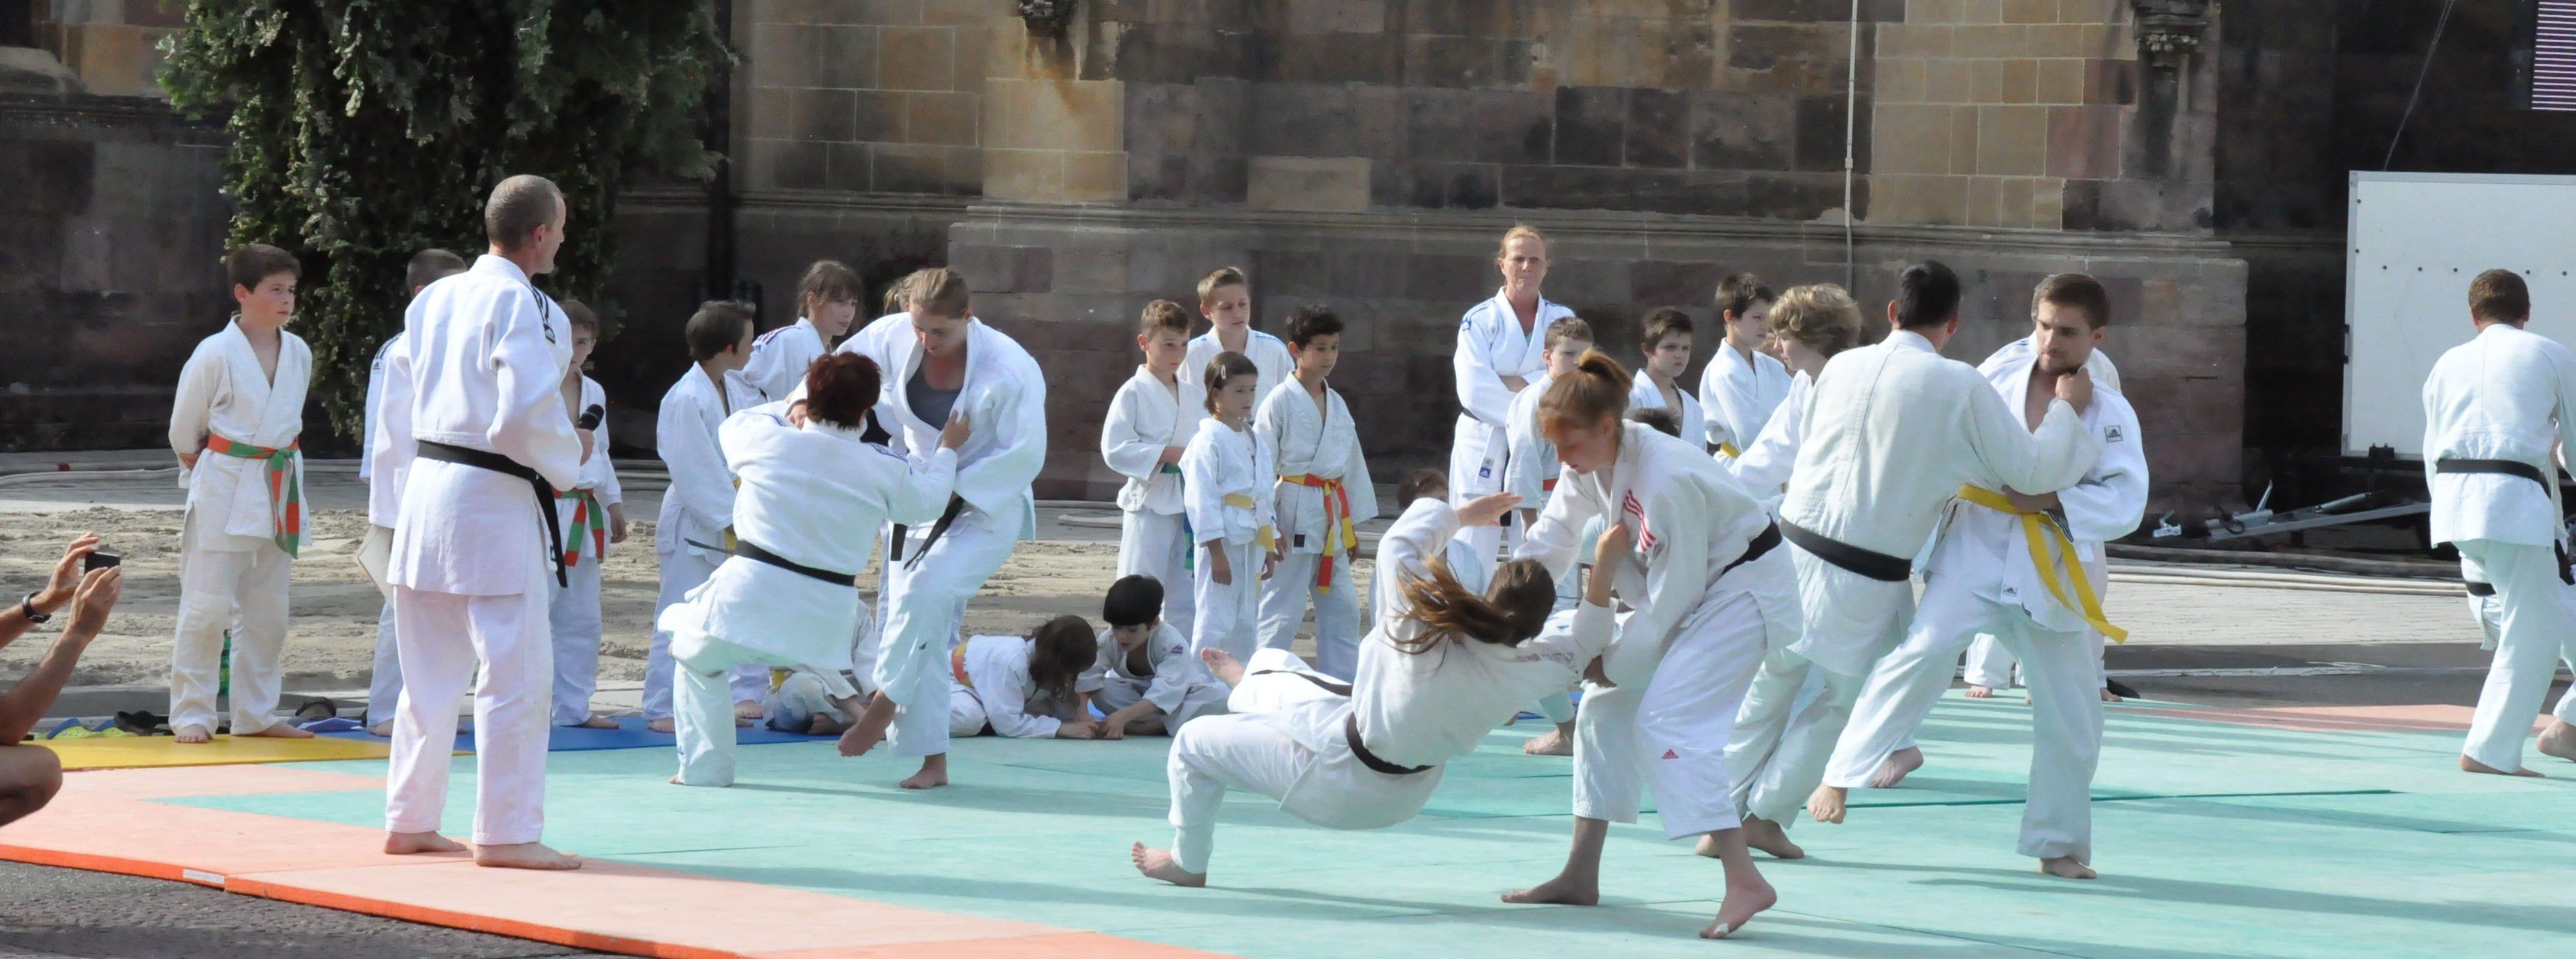 Demonstration de judo